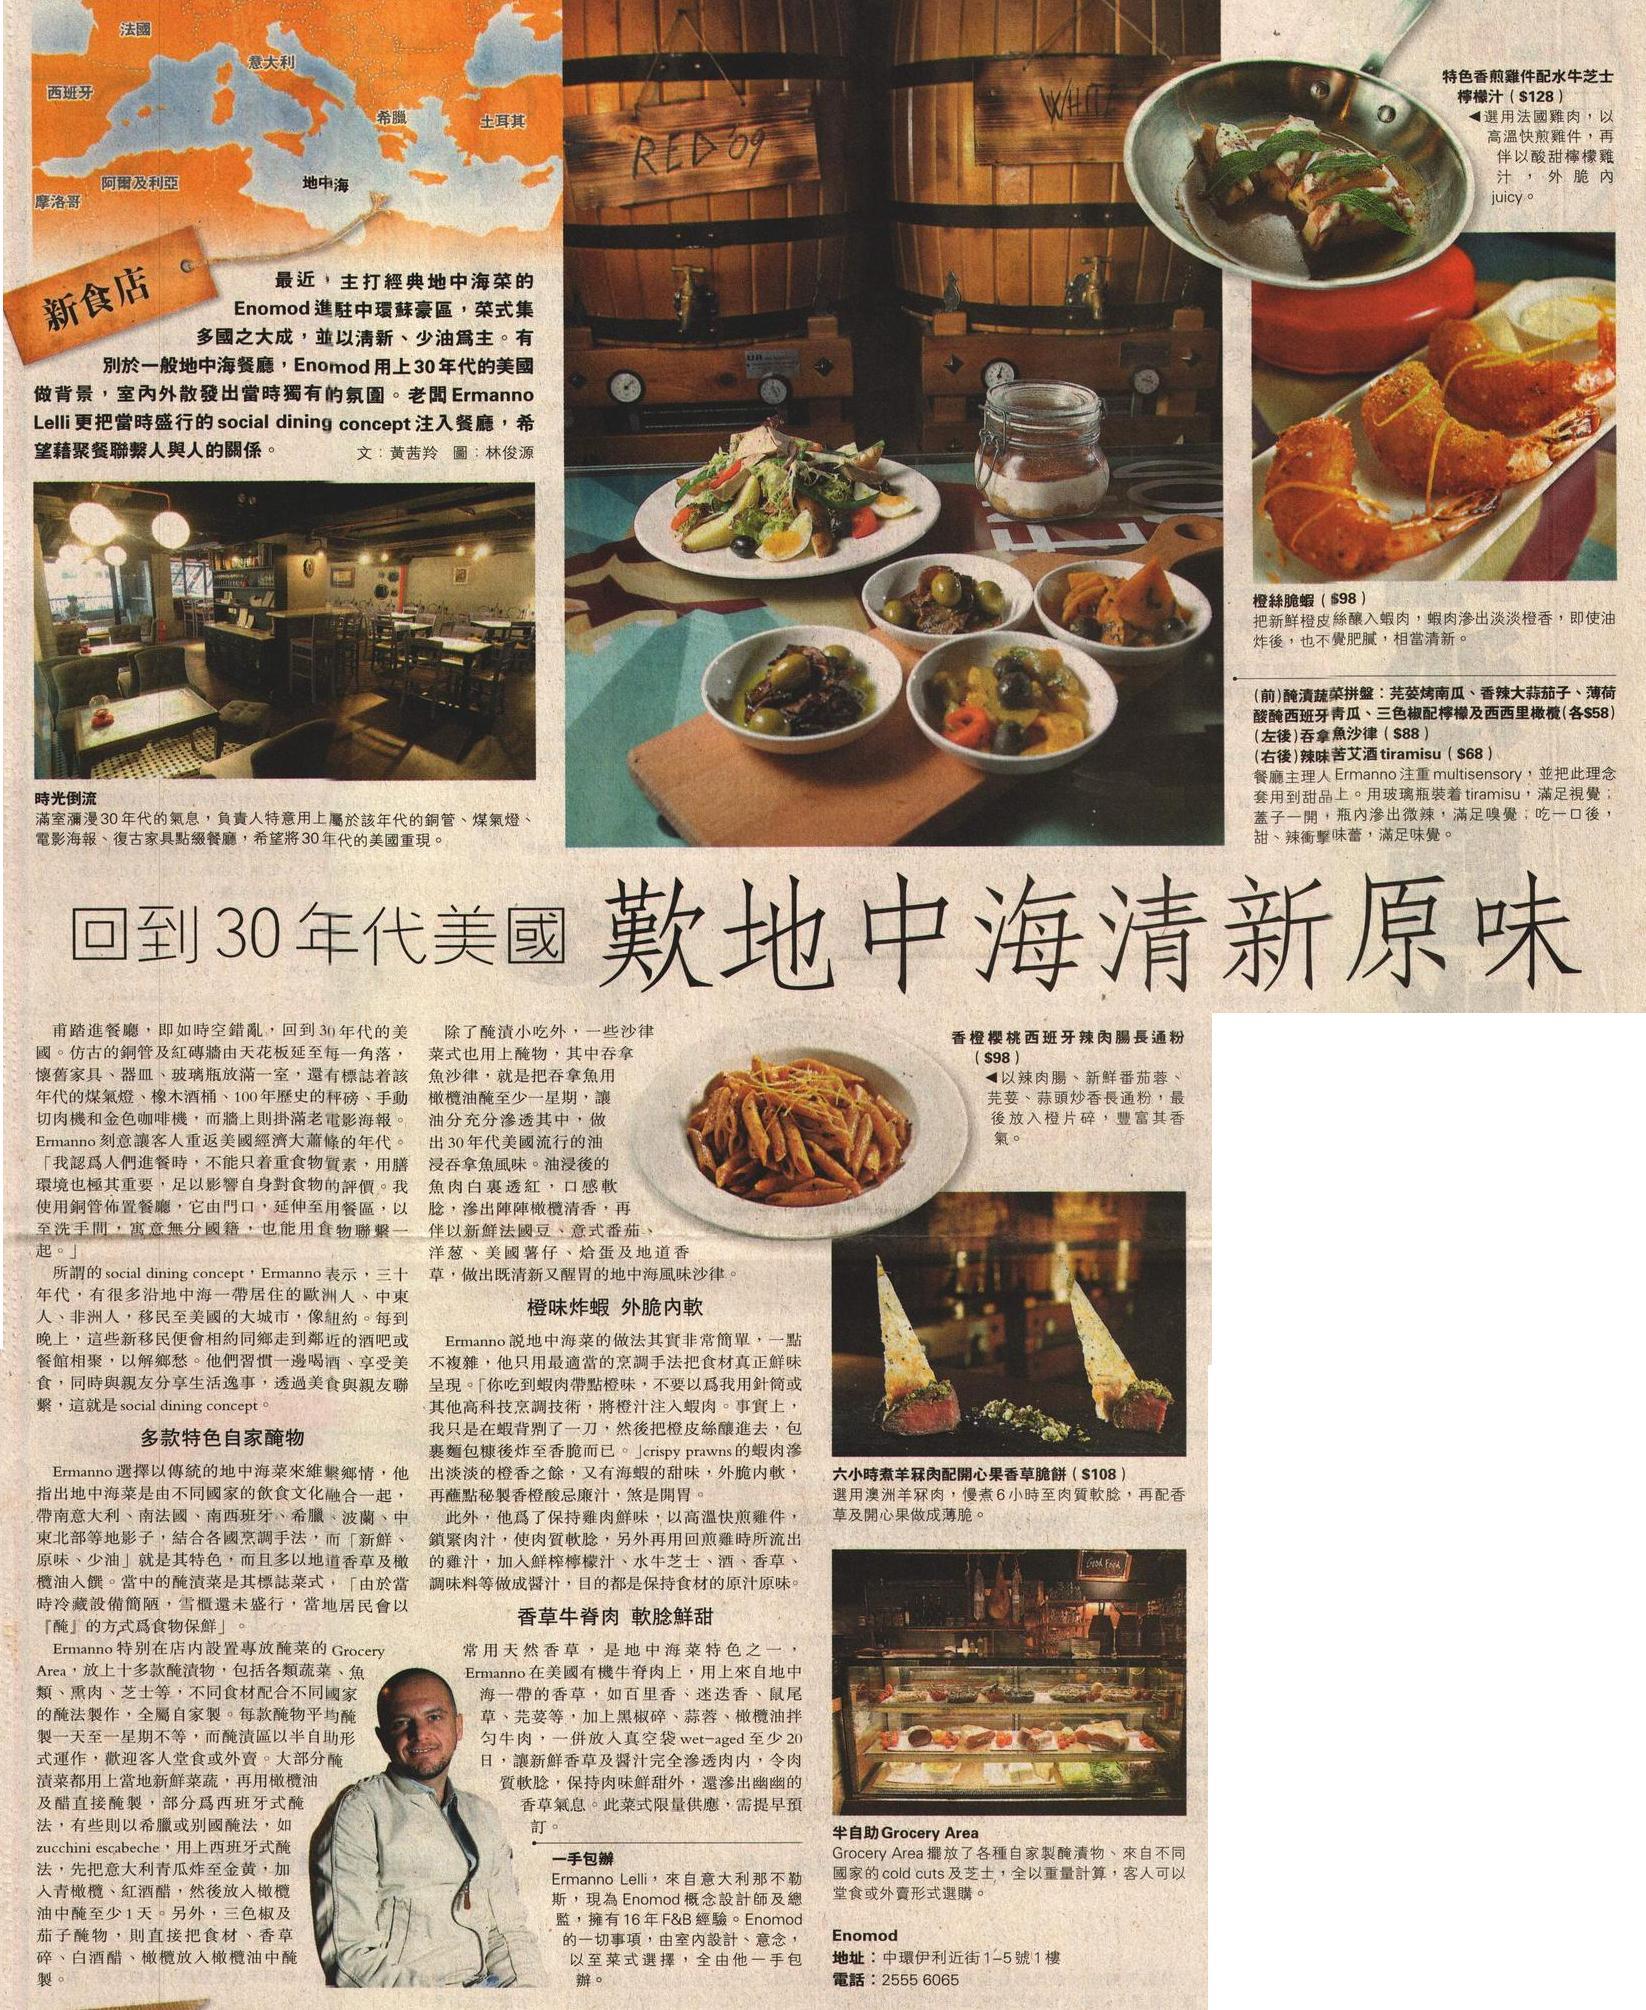 ENOMOD - 27.04 - Ming Pao Daily News (D1).jpg